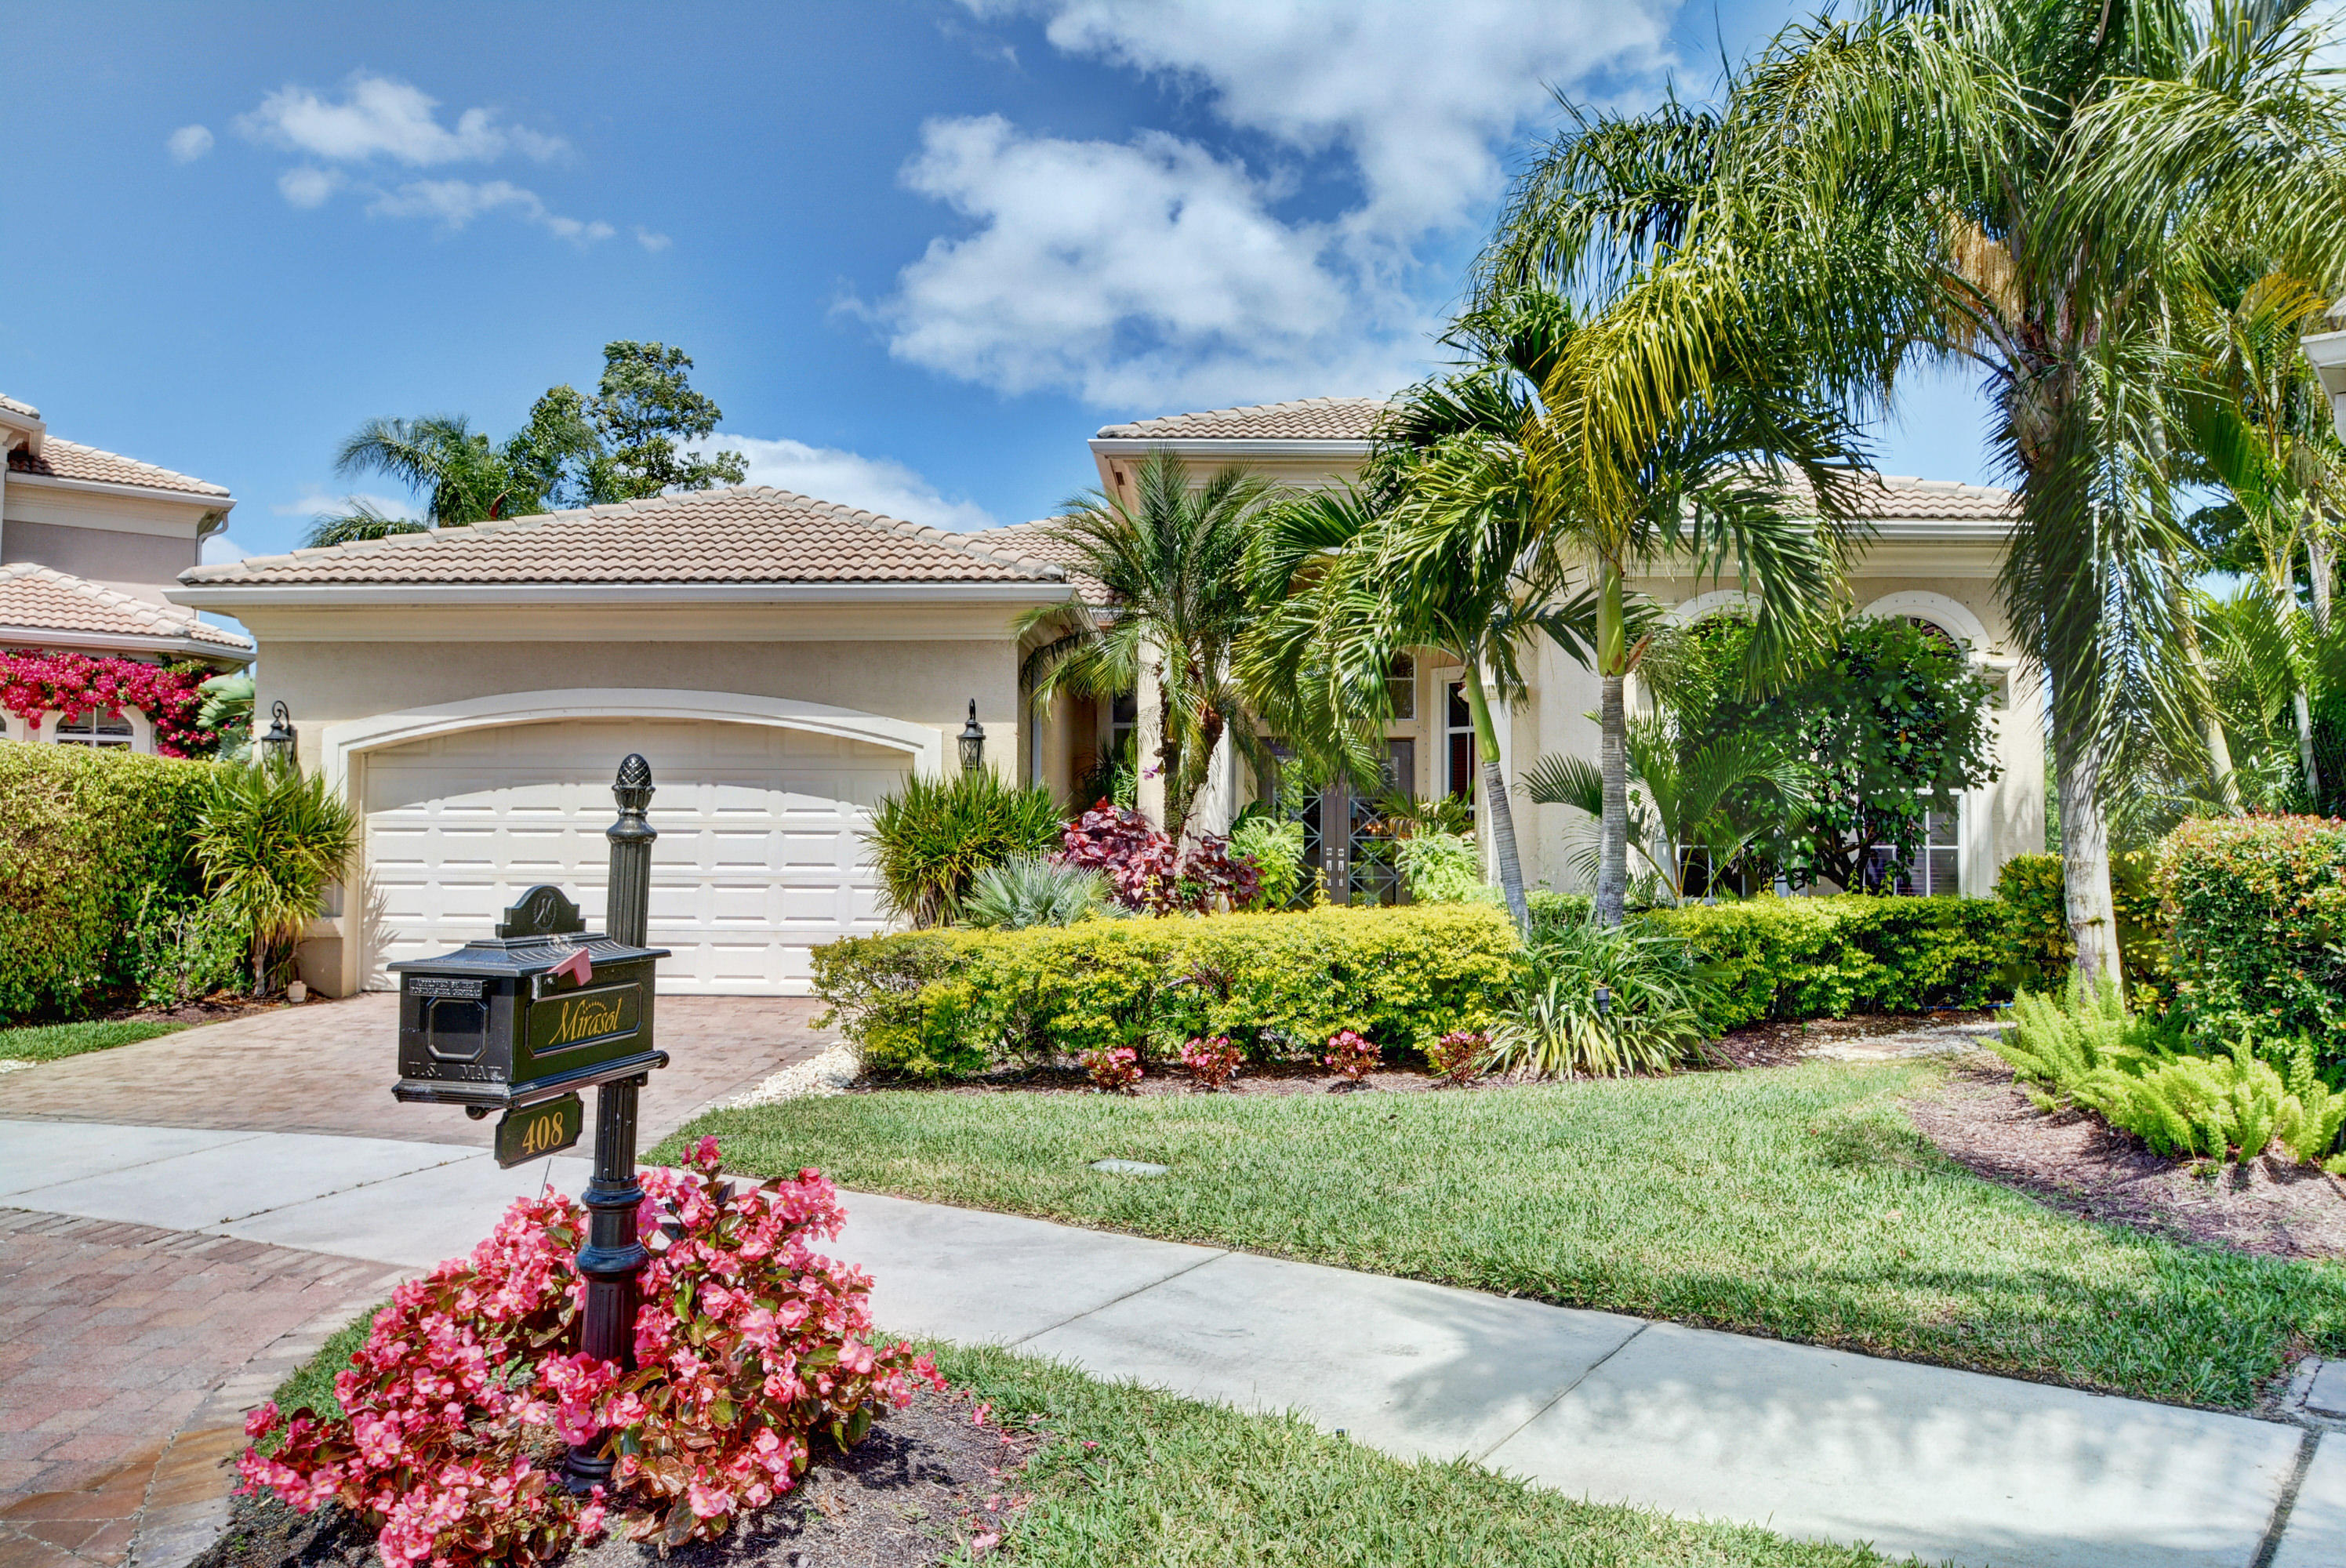 408 Via Placita, Palm Beach Gardens, Florida 33418, 3 Bedrooms Bedrooms, ,3.1 BathroomsBathrooms,A,Single family,Via Placita,RX-10418742